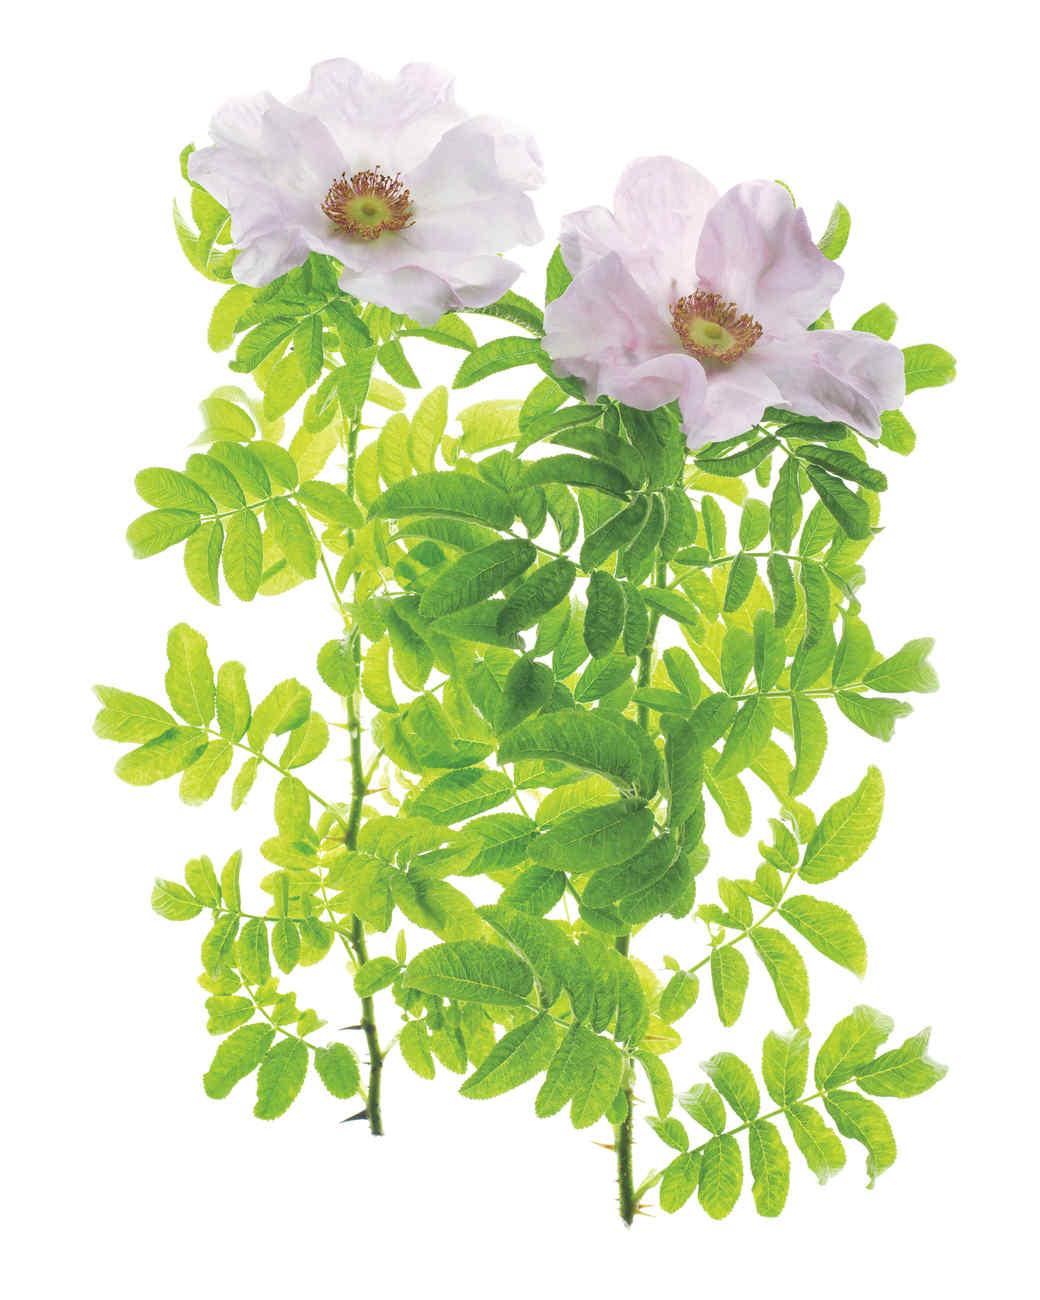 rosa-x-micrugosa-rose-ms108508.jpg